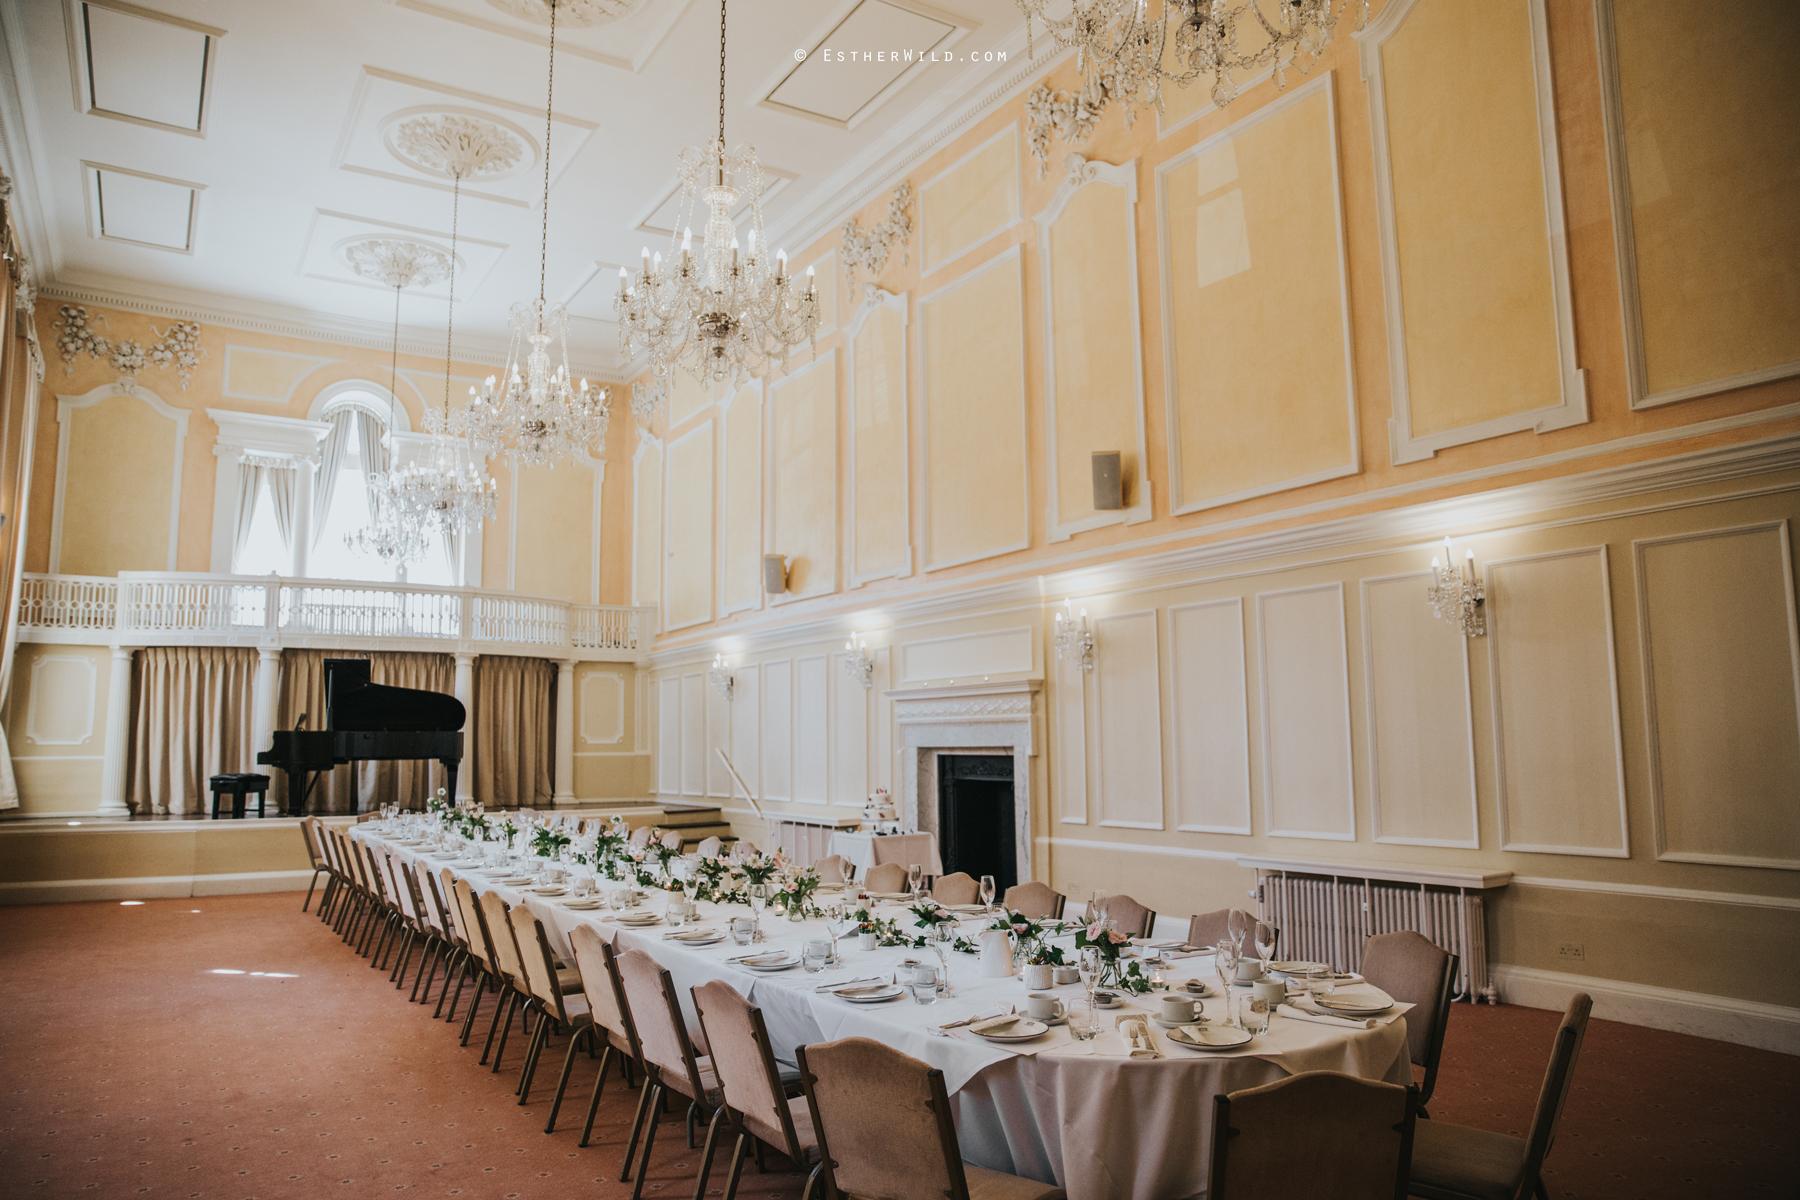 Norwich_Castle_Assembly_House_Norwich_Norfolk_Esther_Wild_Photographer_IMG_1116.jpg